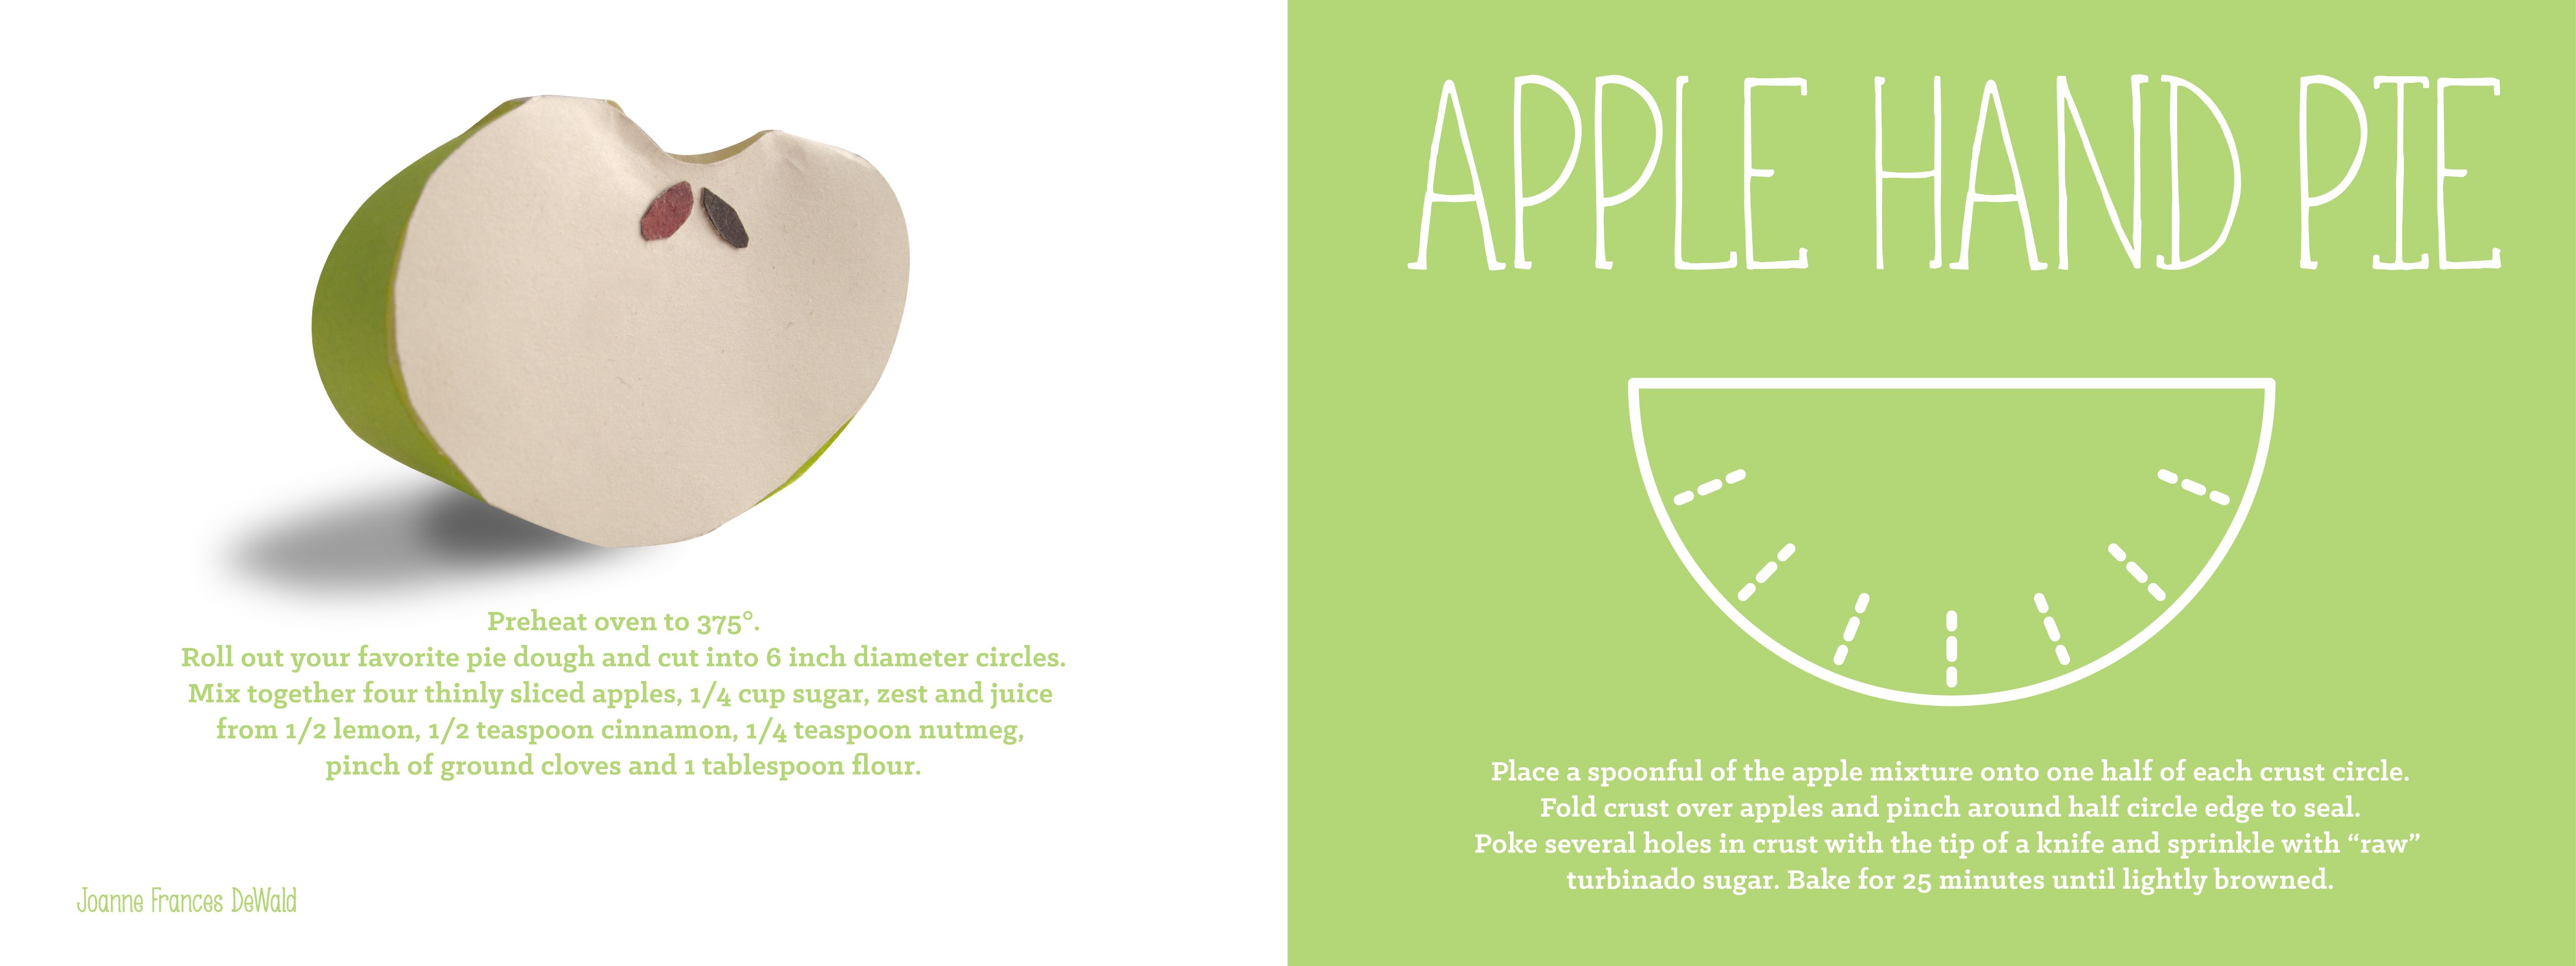 Smallbusinesssaturday Apple Hand Pies Hand Pie Food Banner